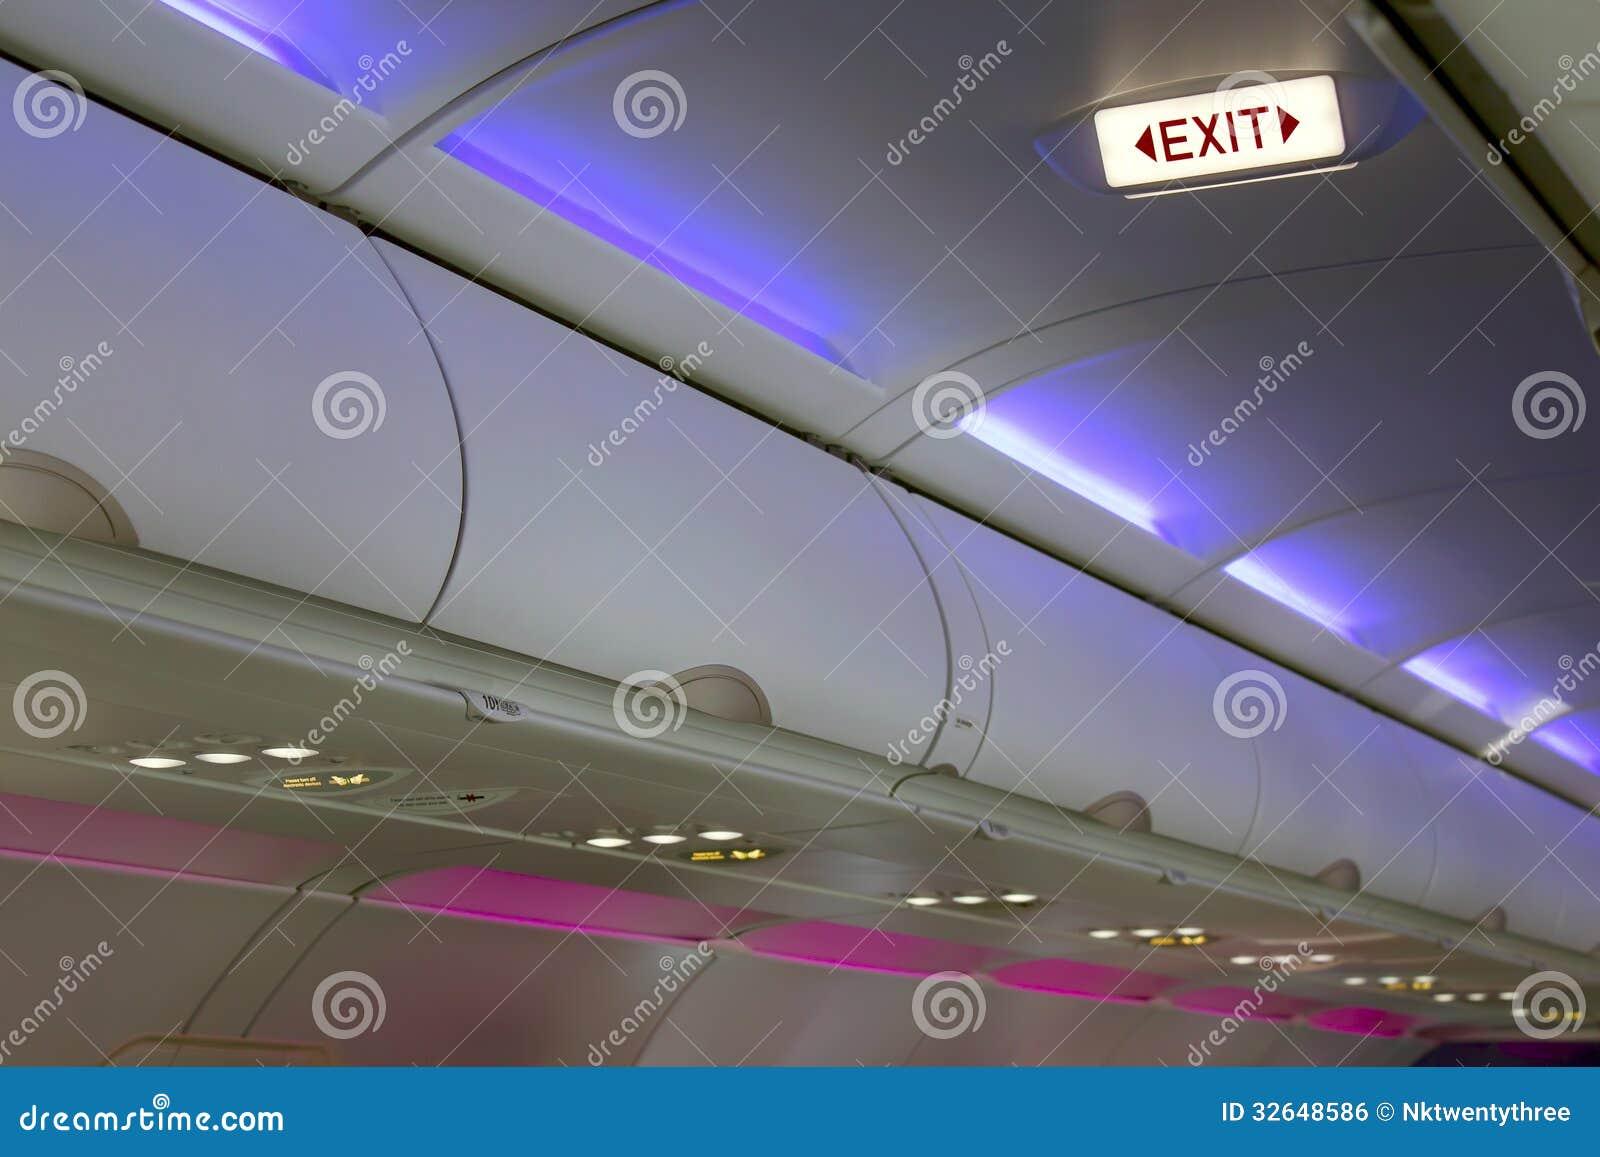 Business flight simulators